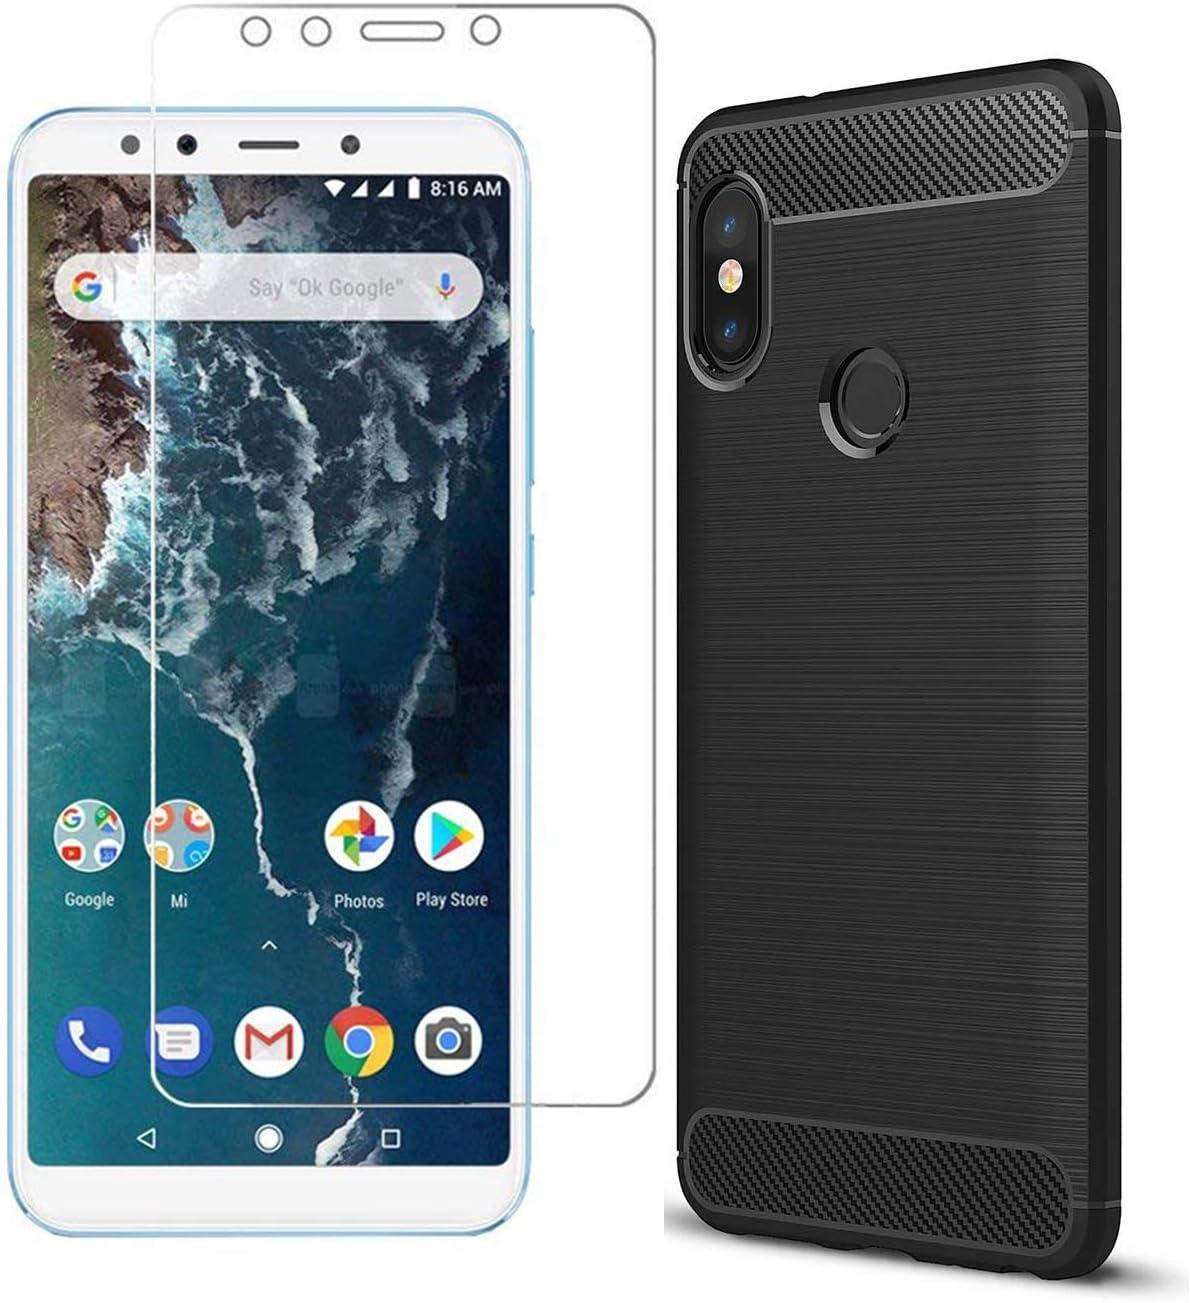 2 en 1] MYLBOO Estuche Xiaomi Mi A2 Soft Tpu (Negro) + protector de pantalla de vidrio templado: Amazon.es: Electrónica